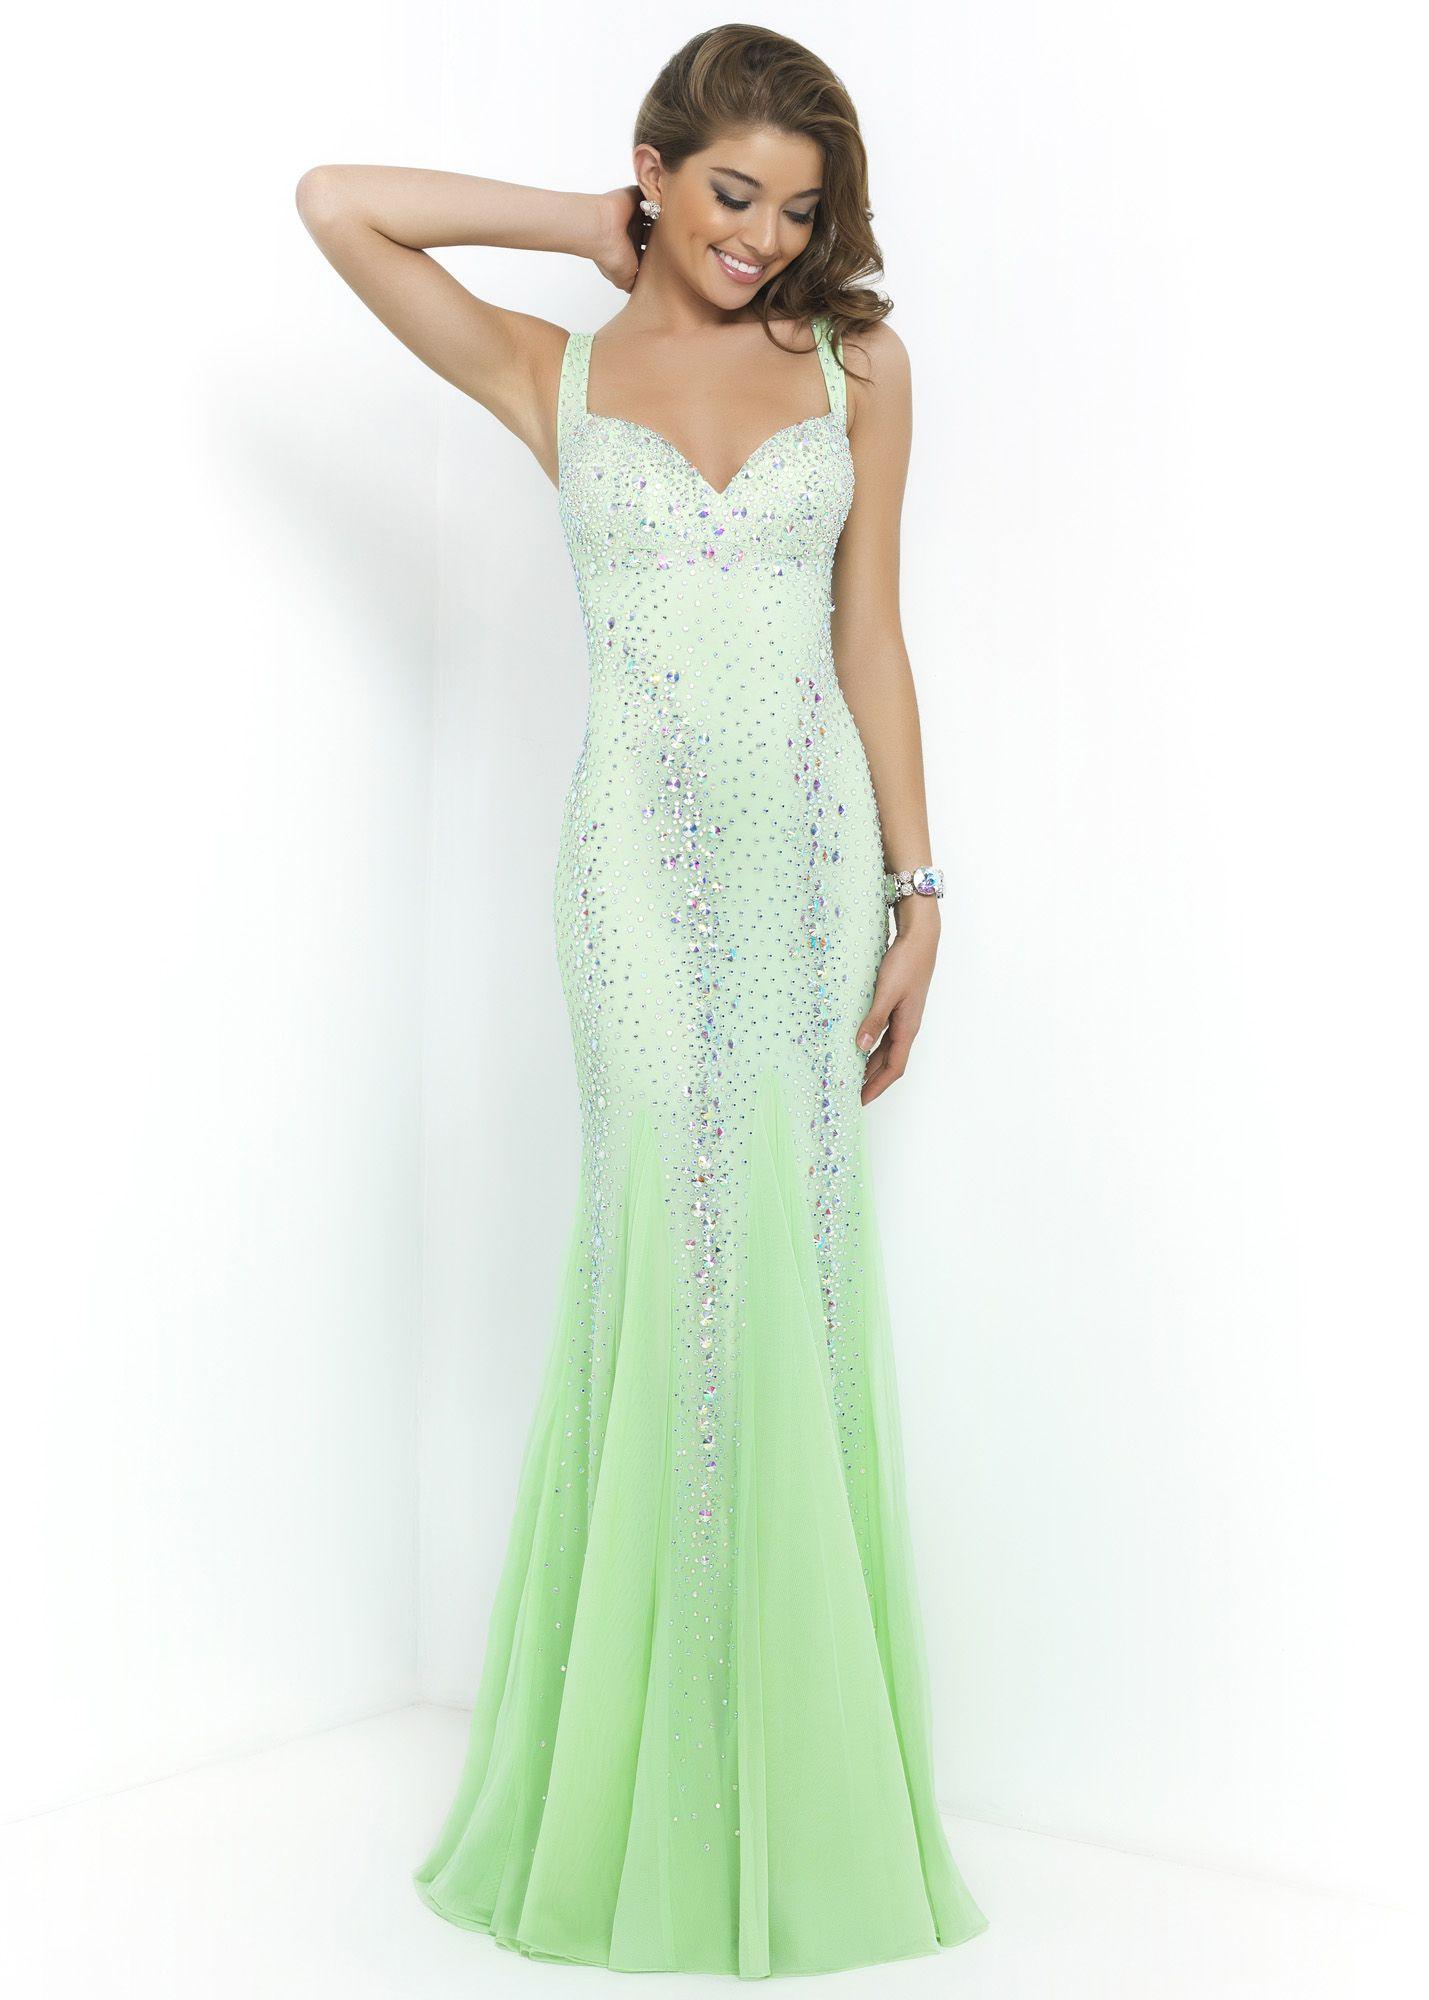 Blush sexy low back gown dresses pinterest honeydew